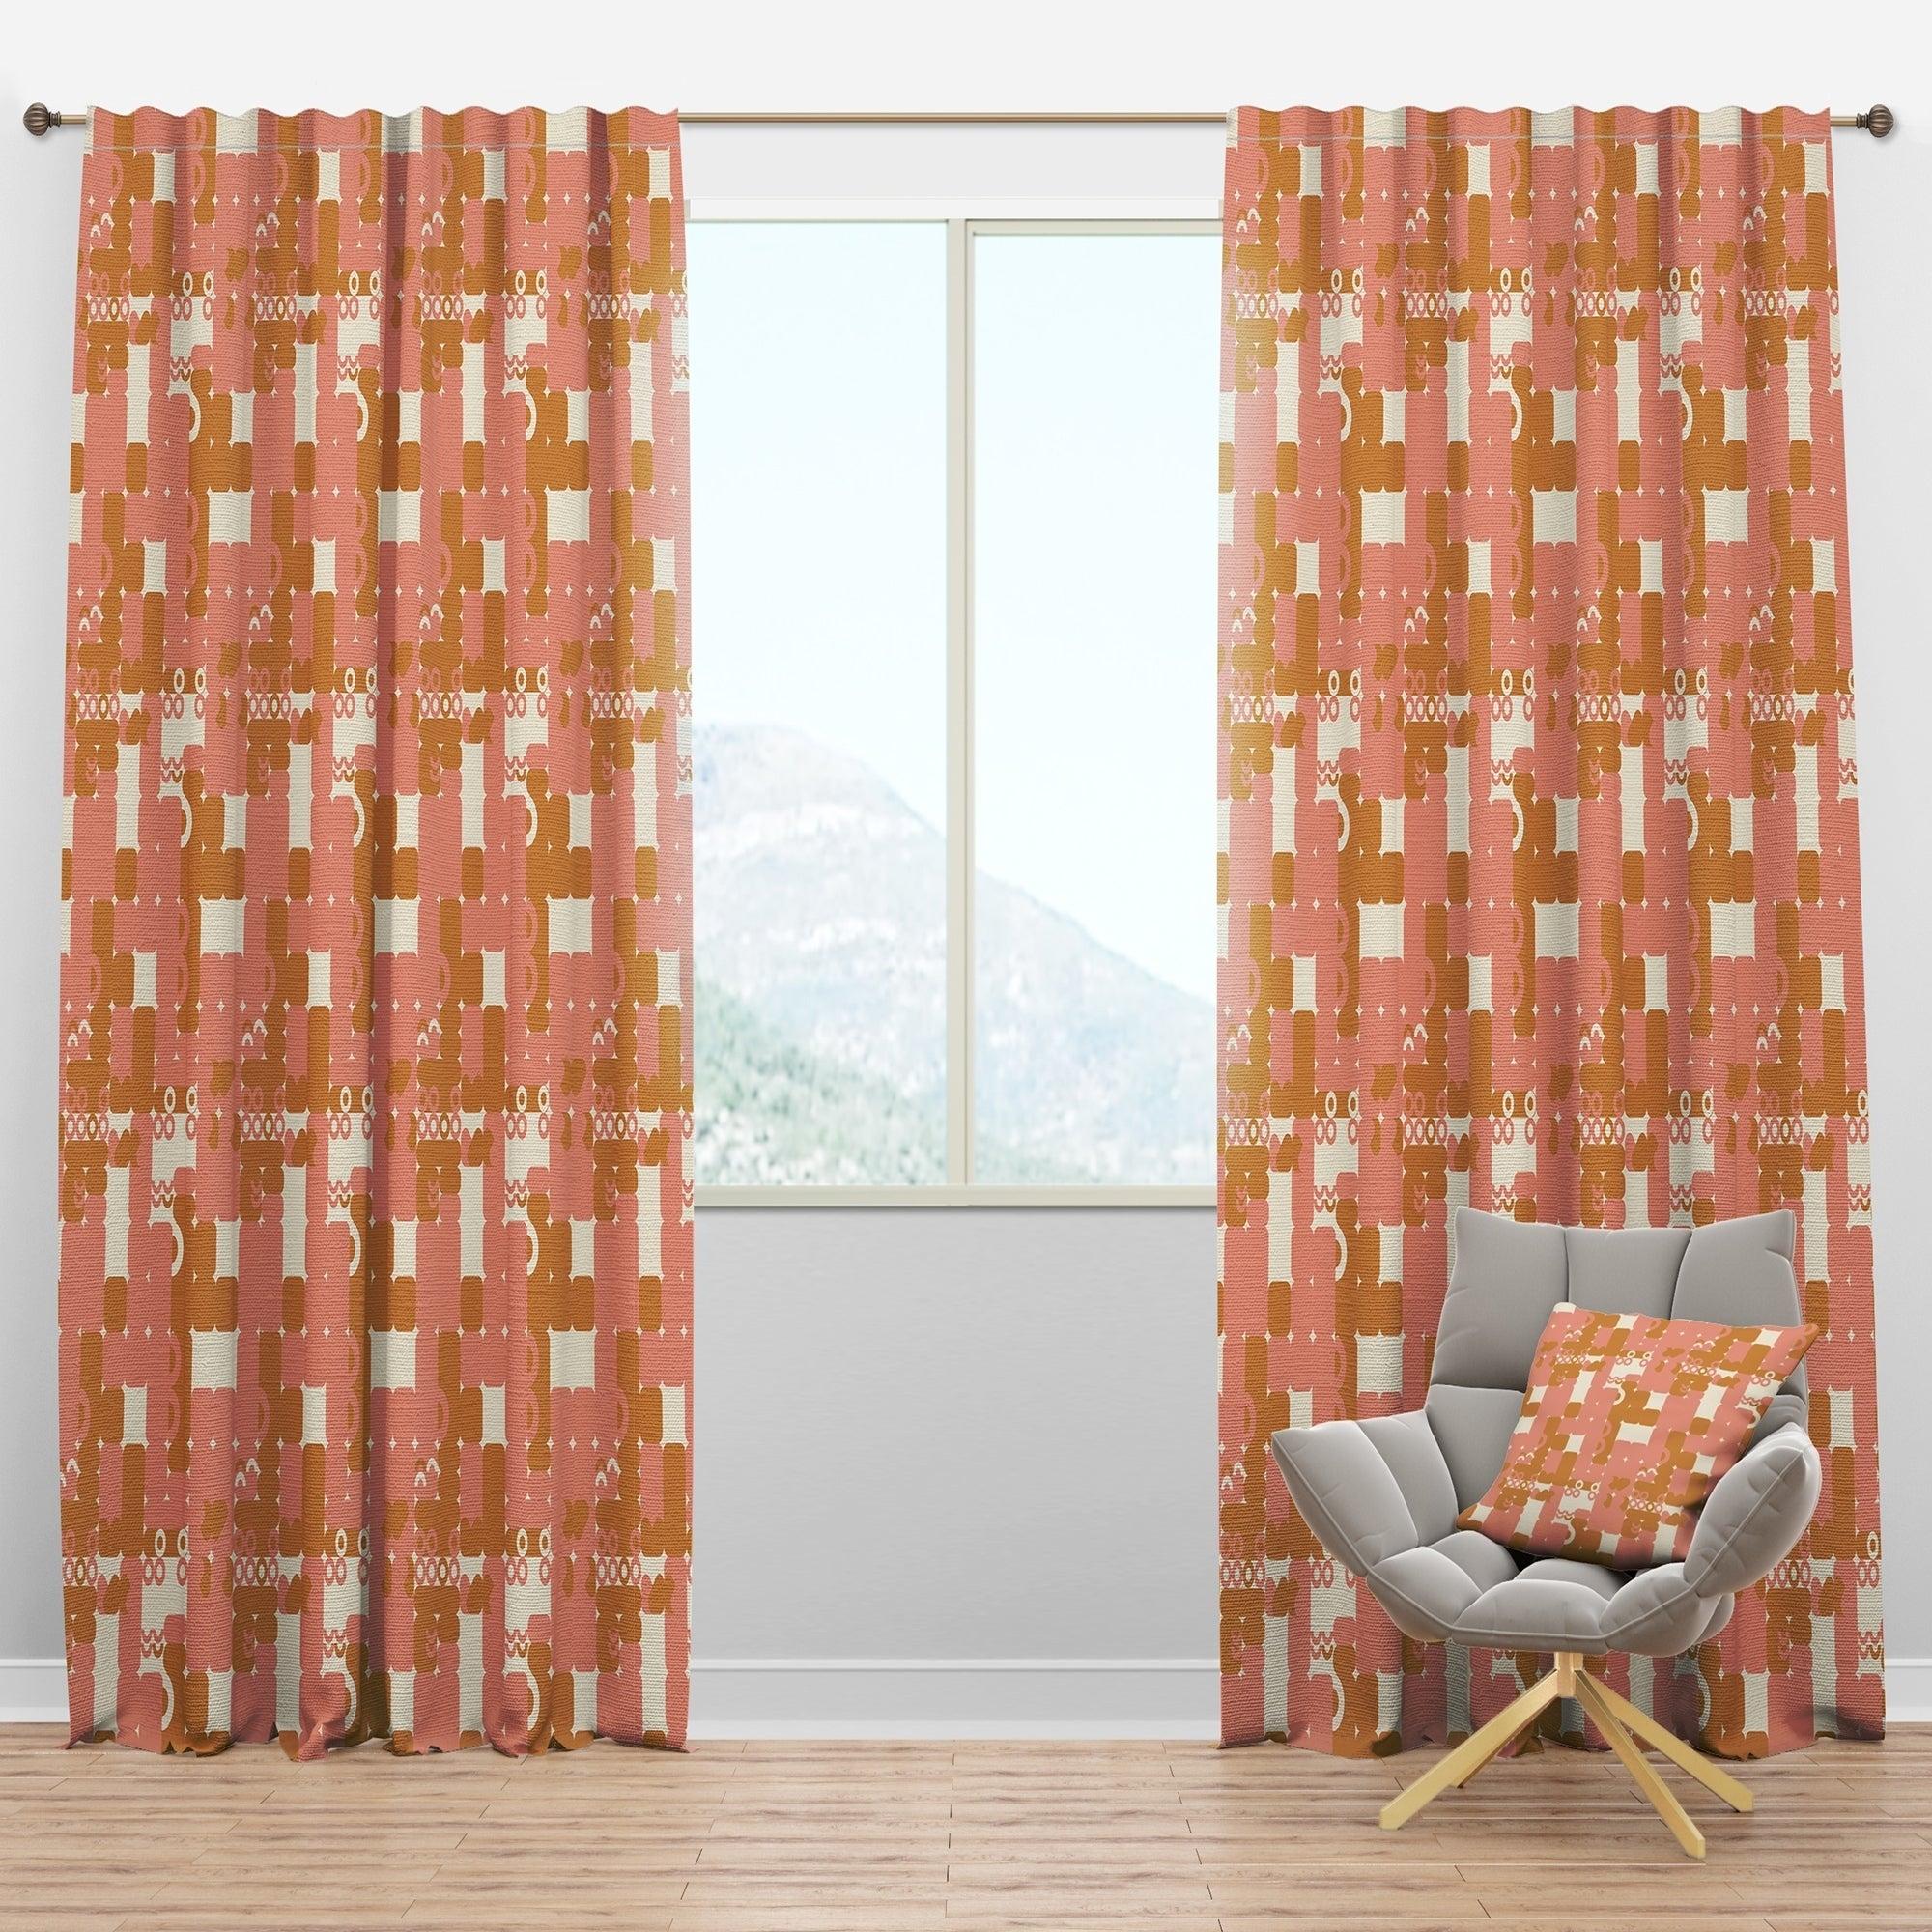 Image of: Shop Designart Pink Retro Abstract Design Mid Century Modern Curtain Panels Overstock 29625980